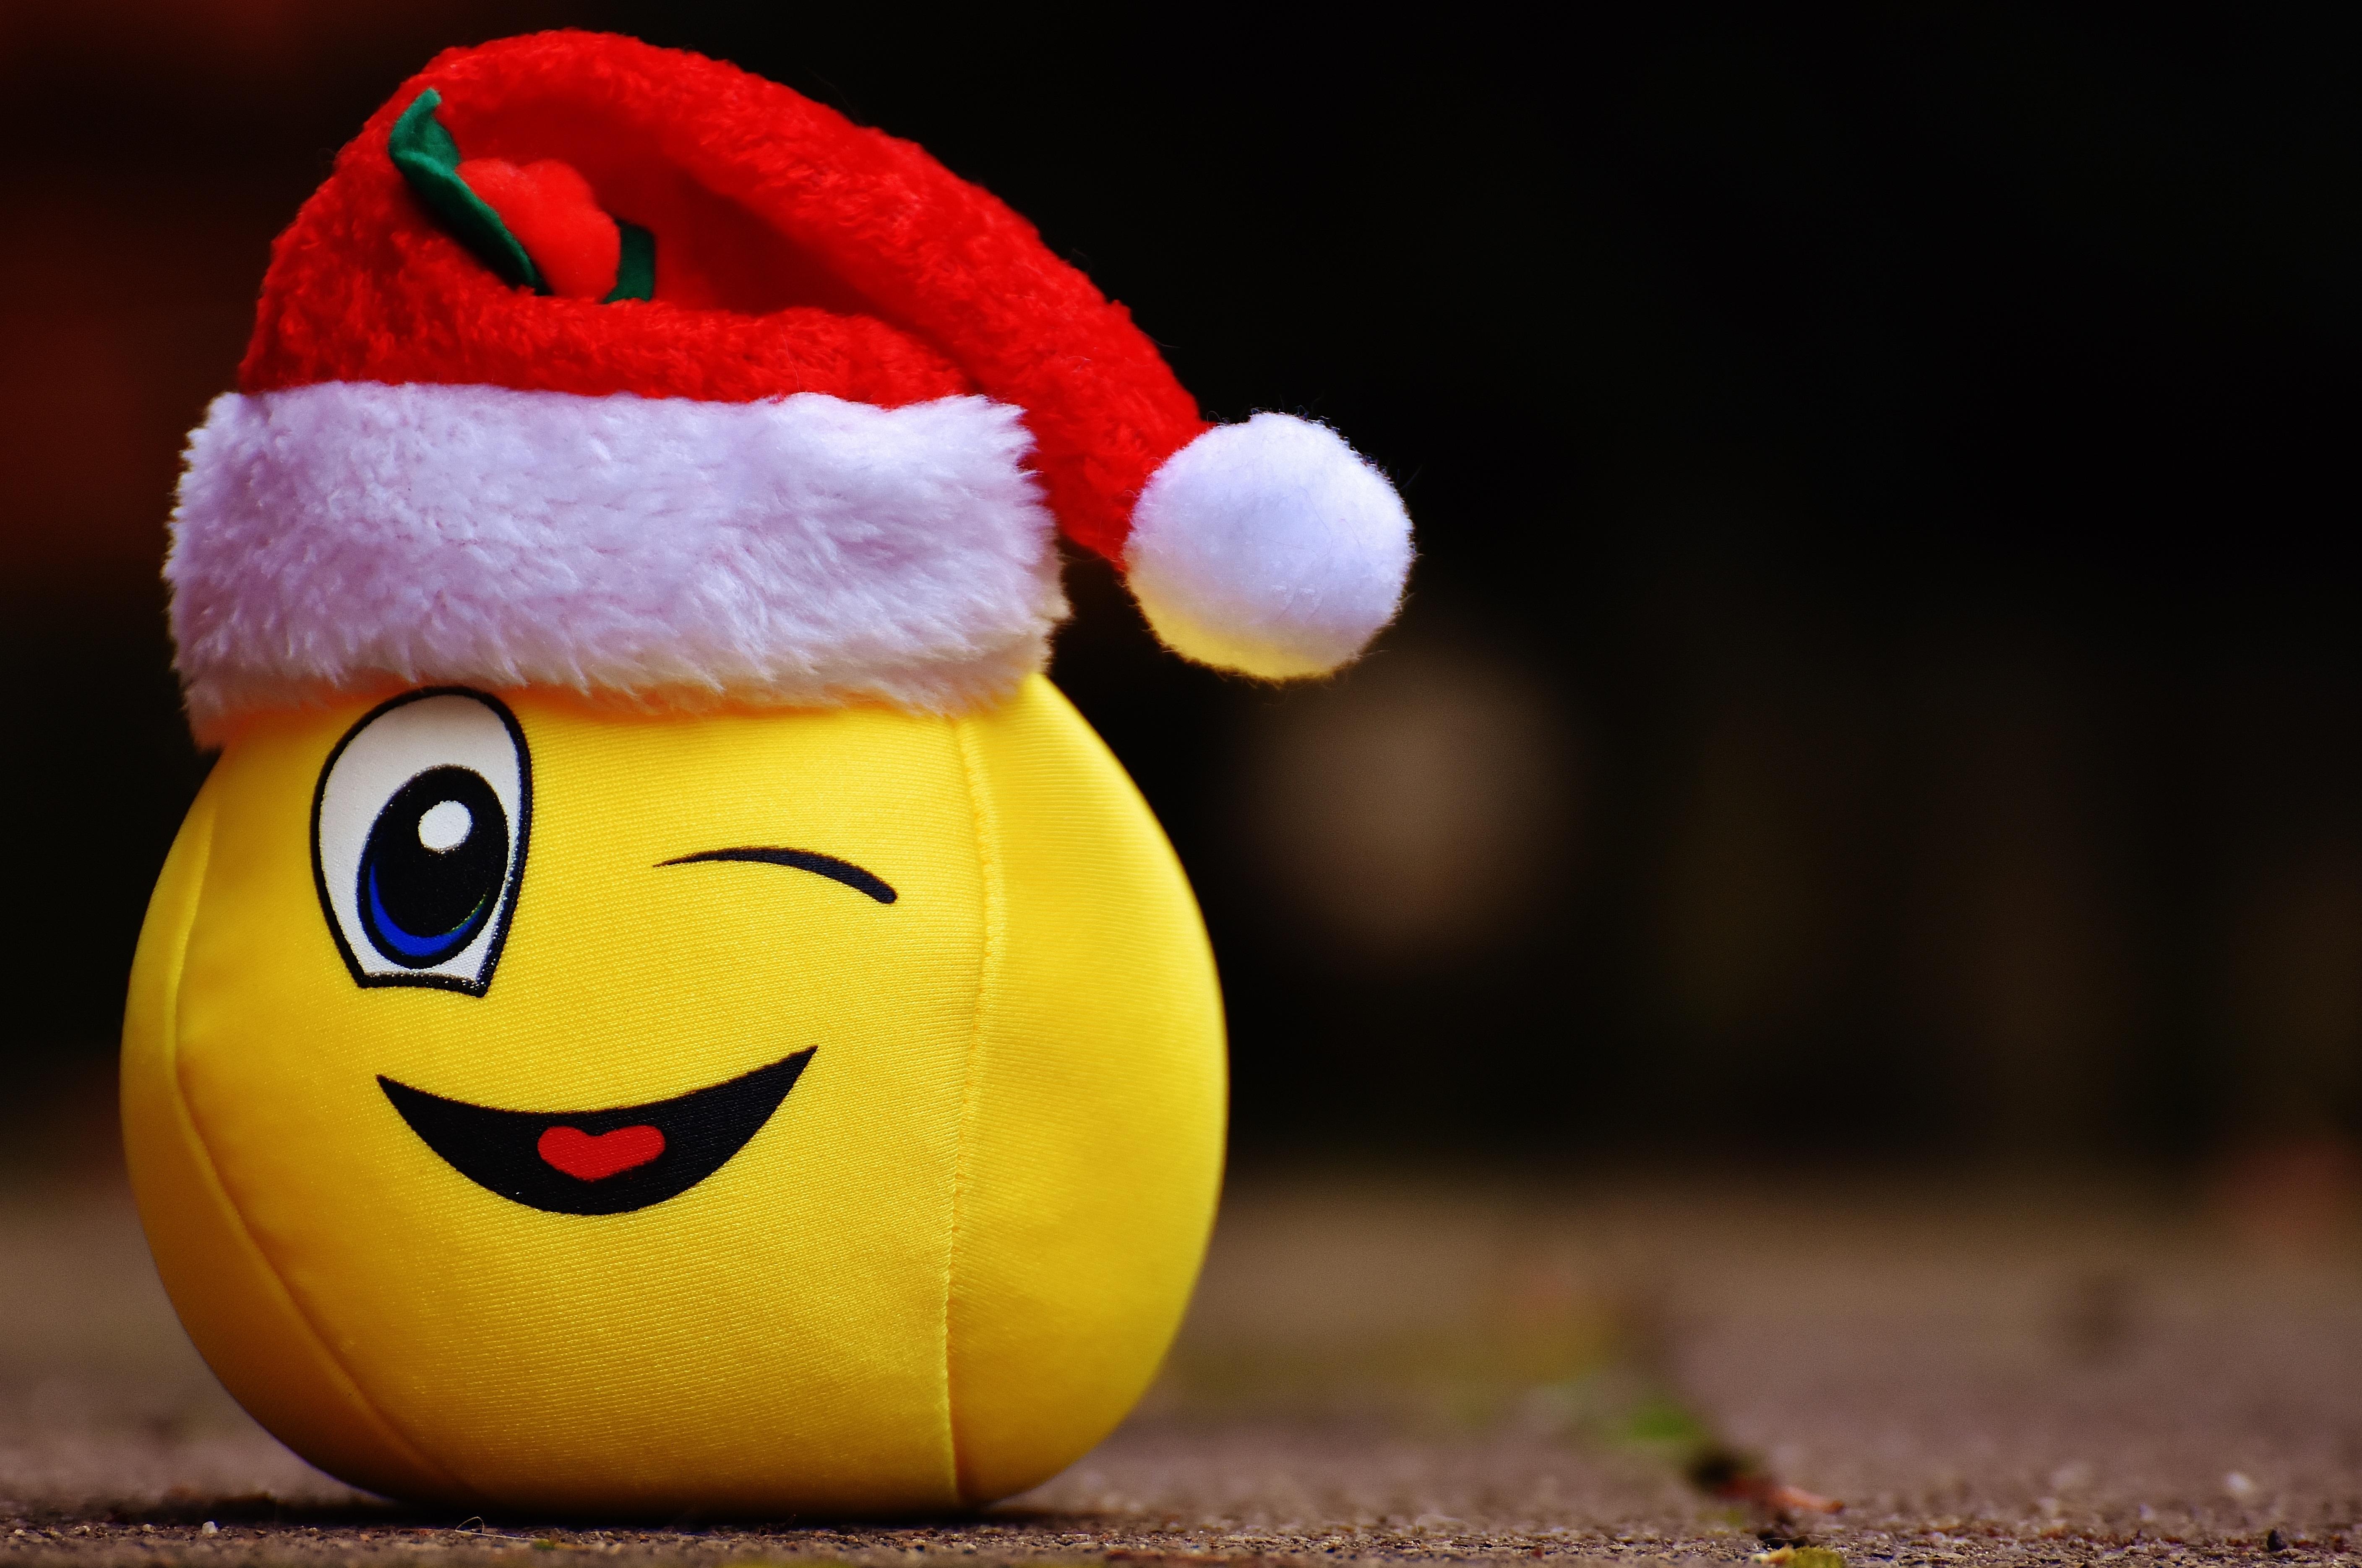 Gambar Bunga Hari Natal Mainan Tertawa Hat Santa Lucu